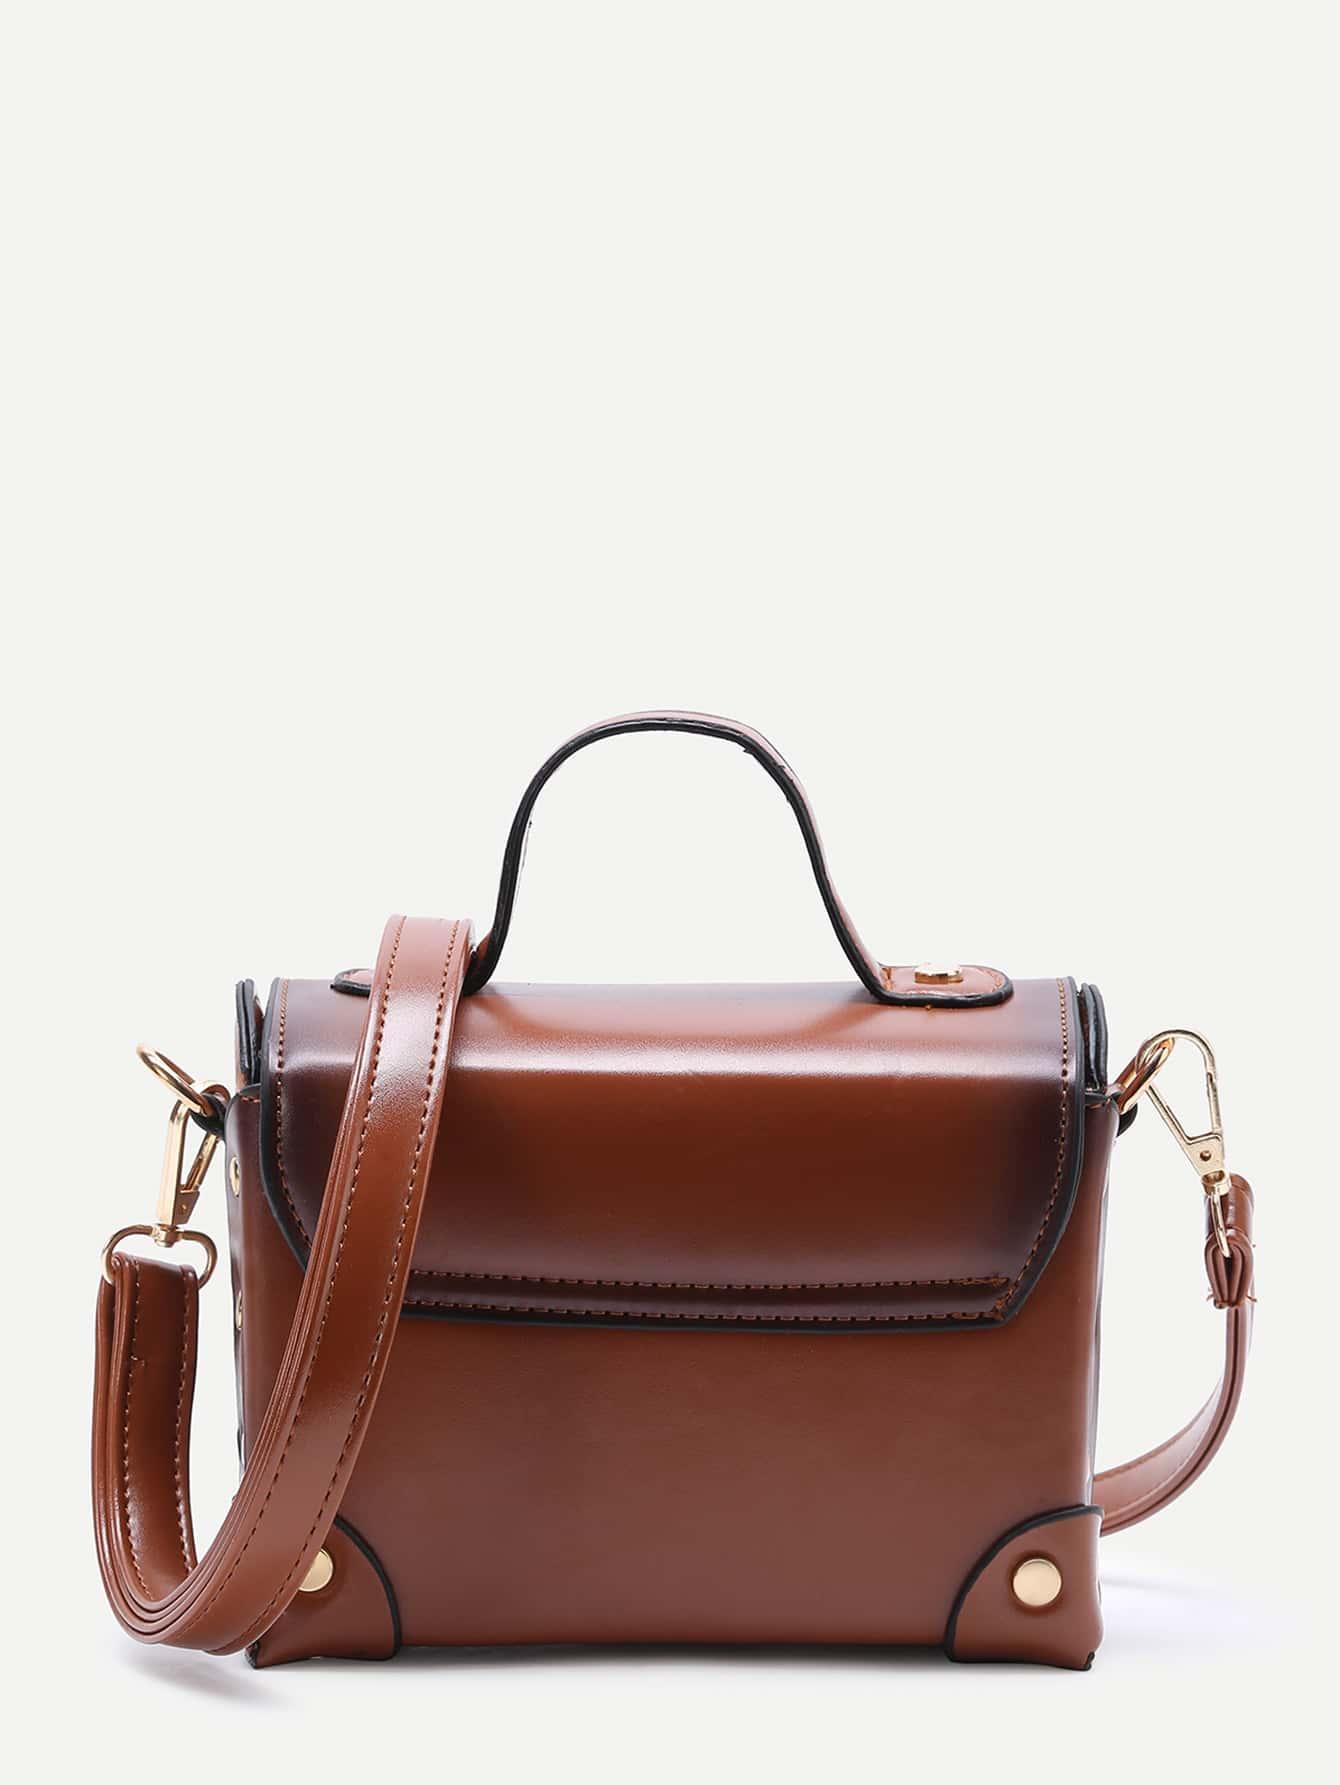 bag170224304_1